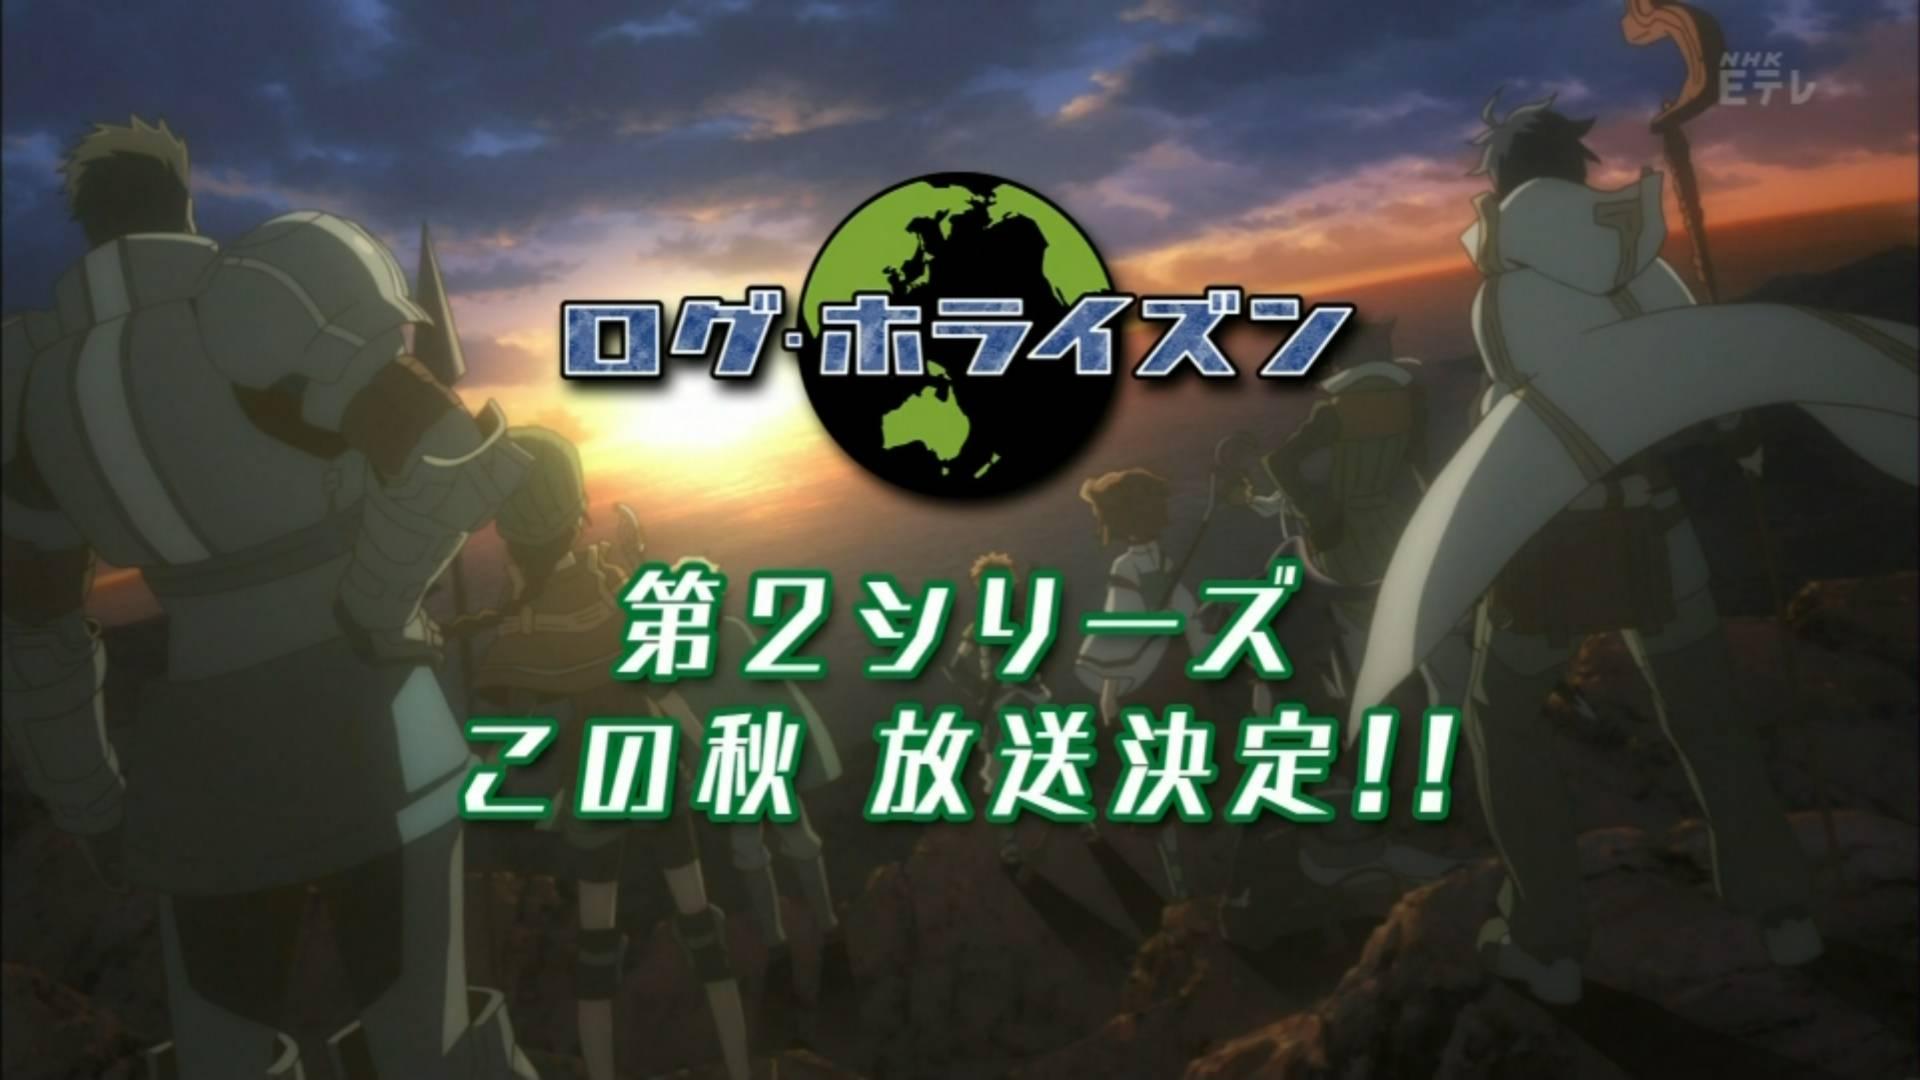 Log Horizon Sequel Anime Airs This October Image